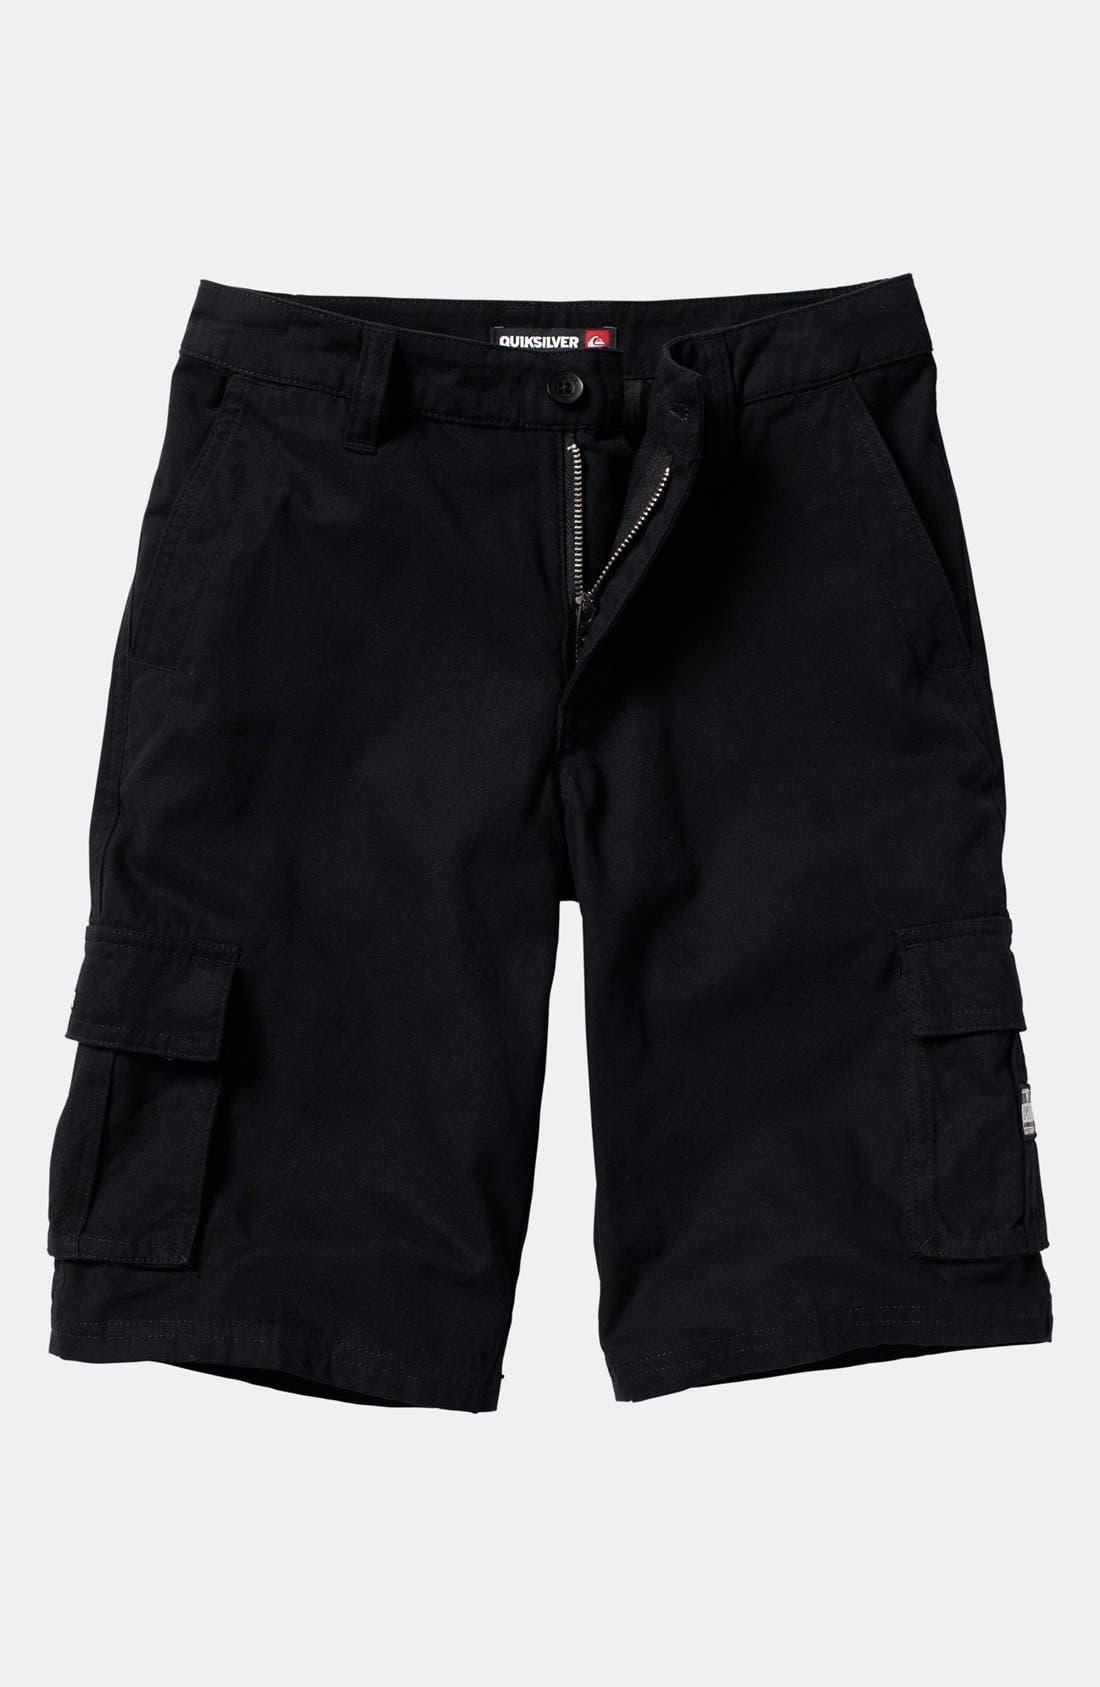 Main Image - Quiksilver 'Sue Fley' Shorts